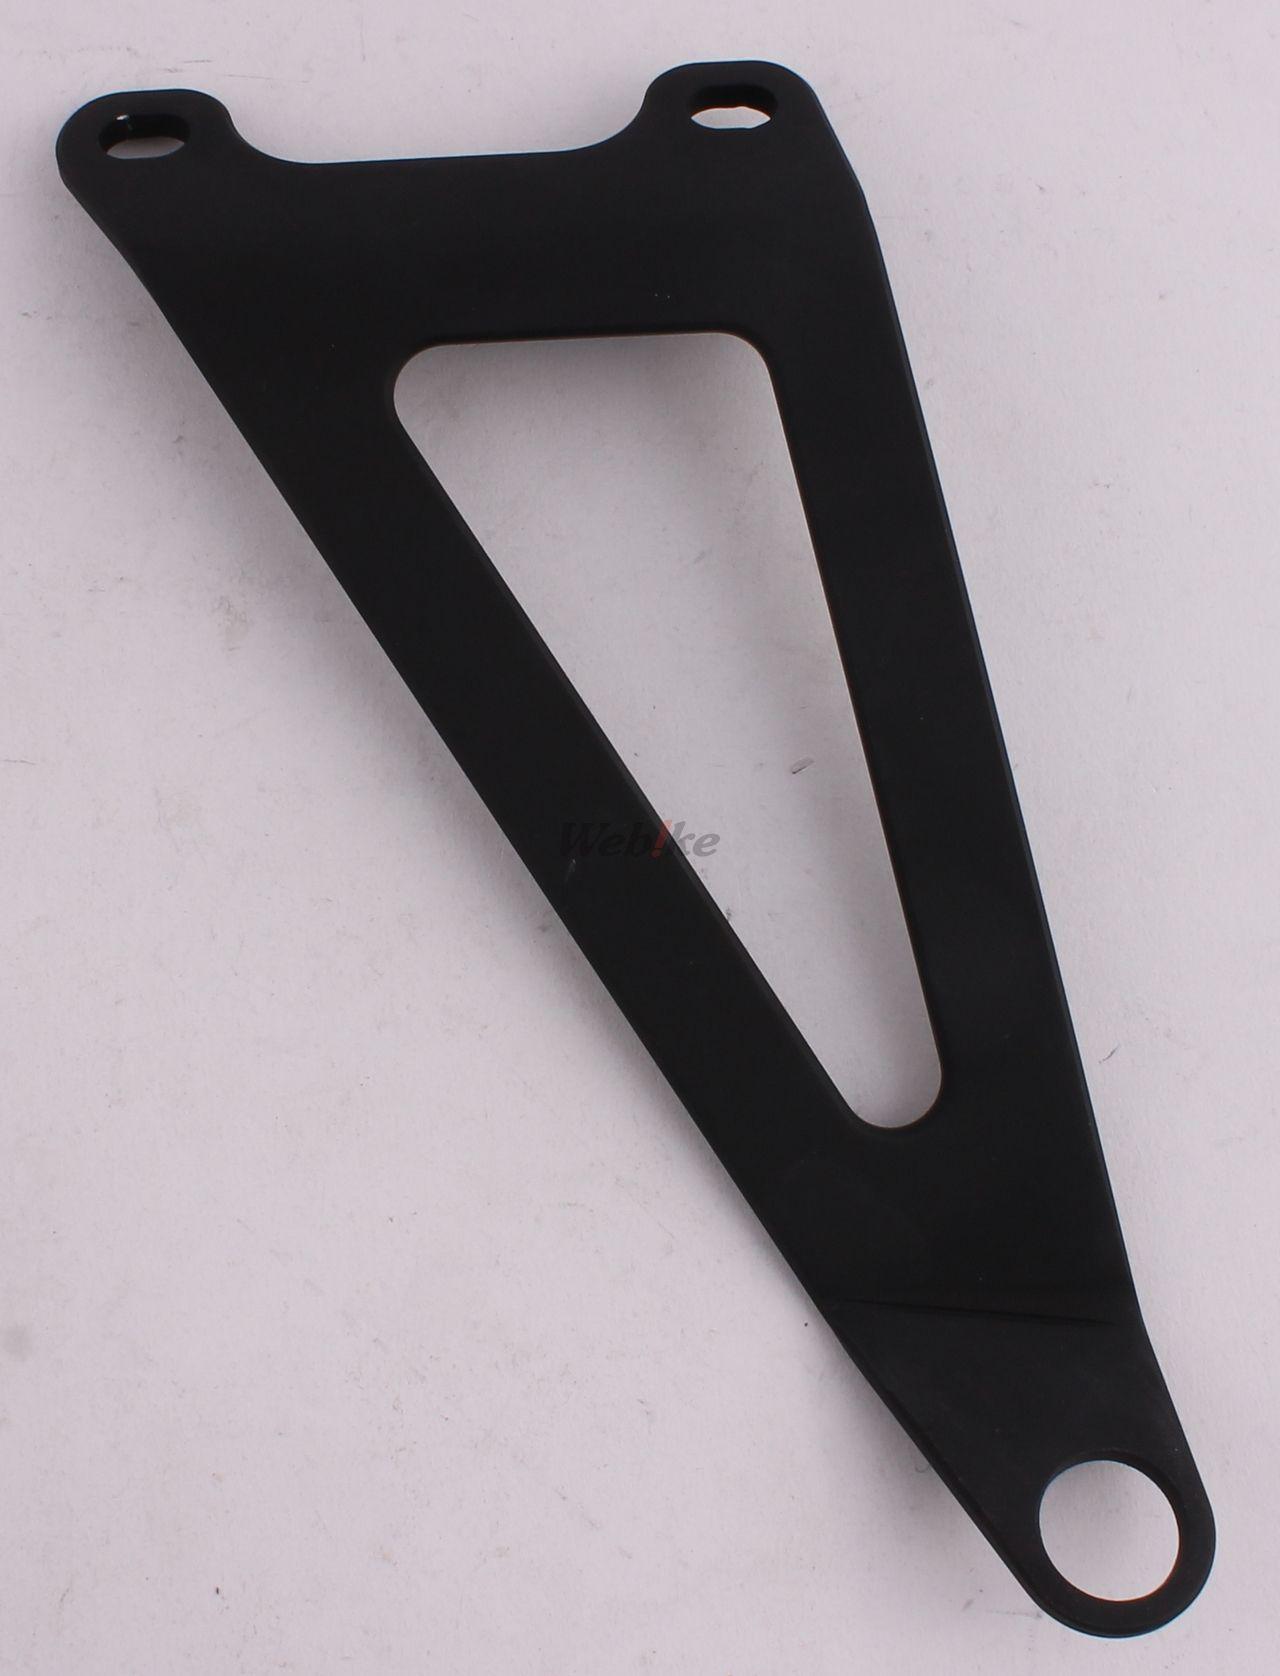 【YOSHIMURA】鋁合金排氣管吊環 - 「Webike-摩托百貨」